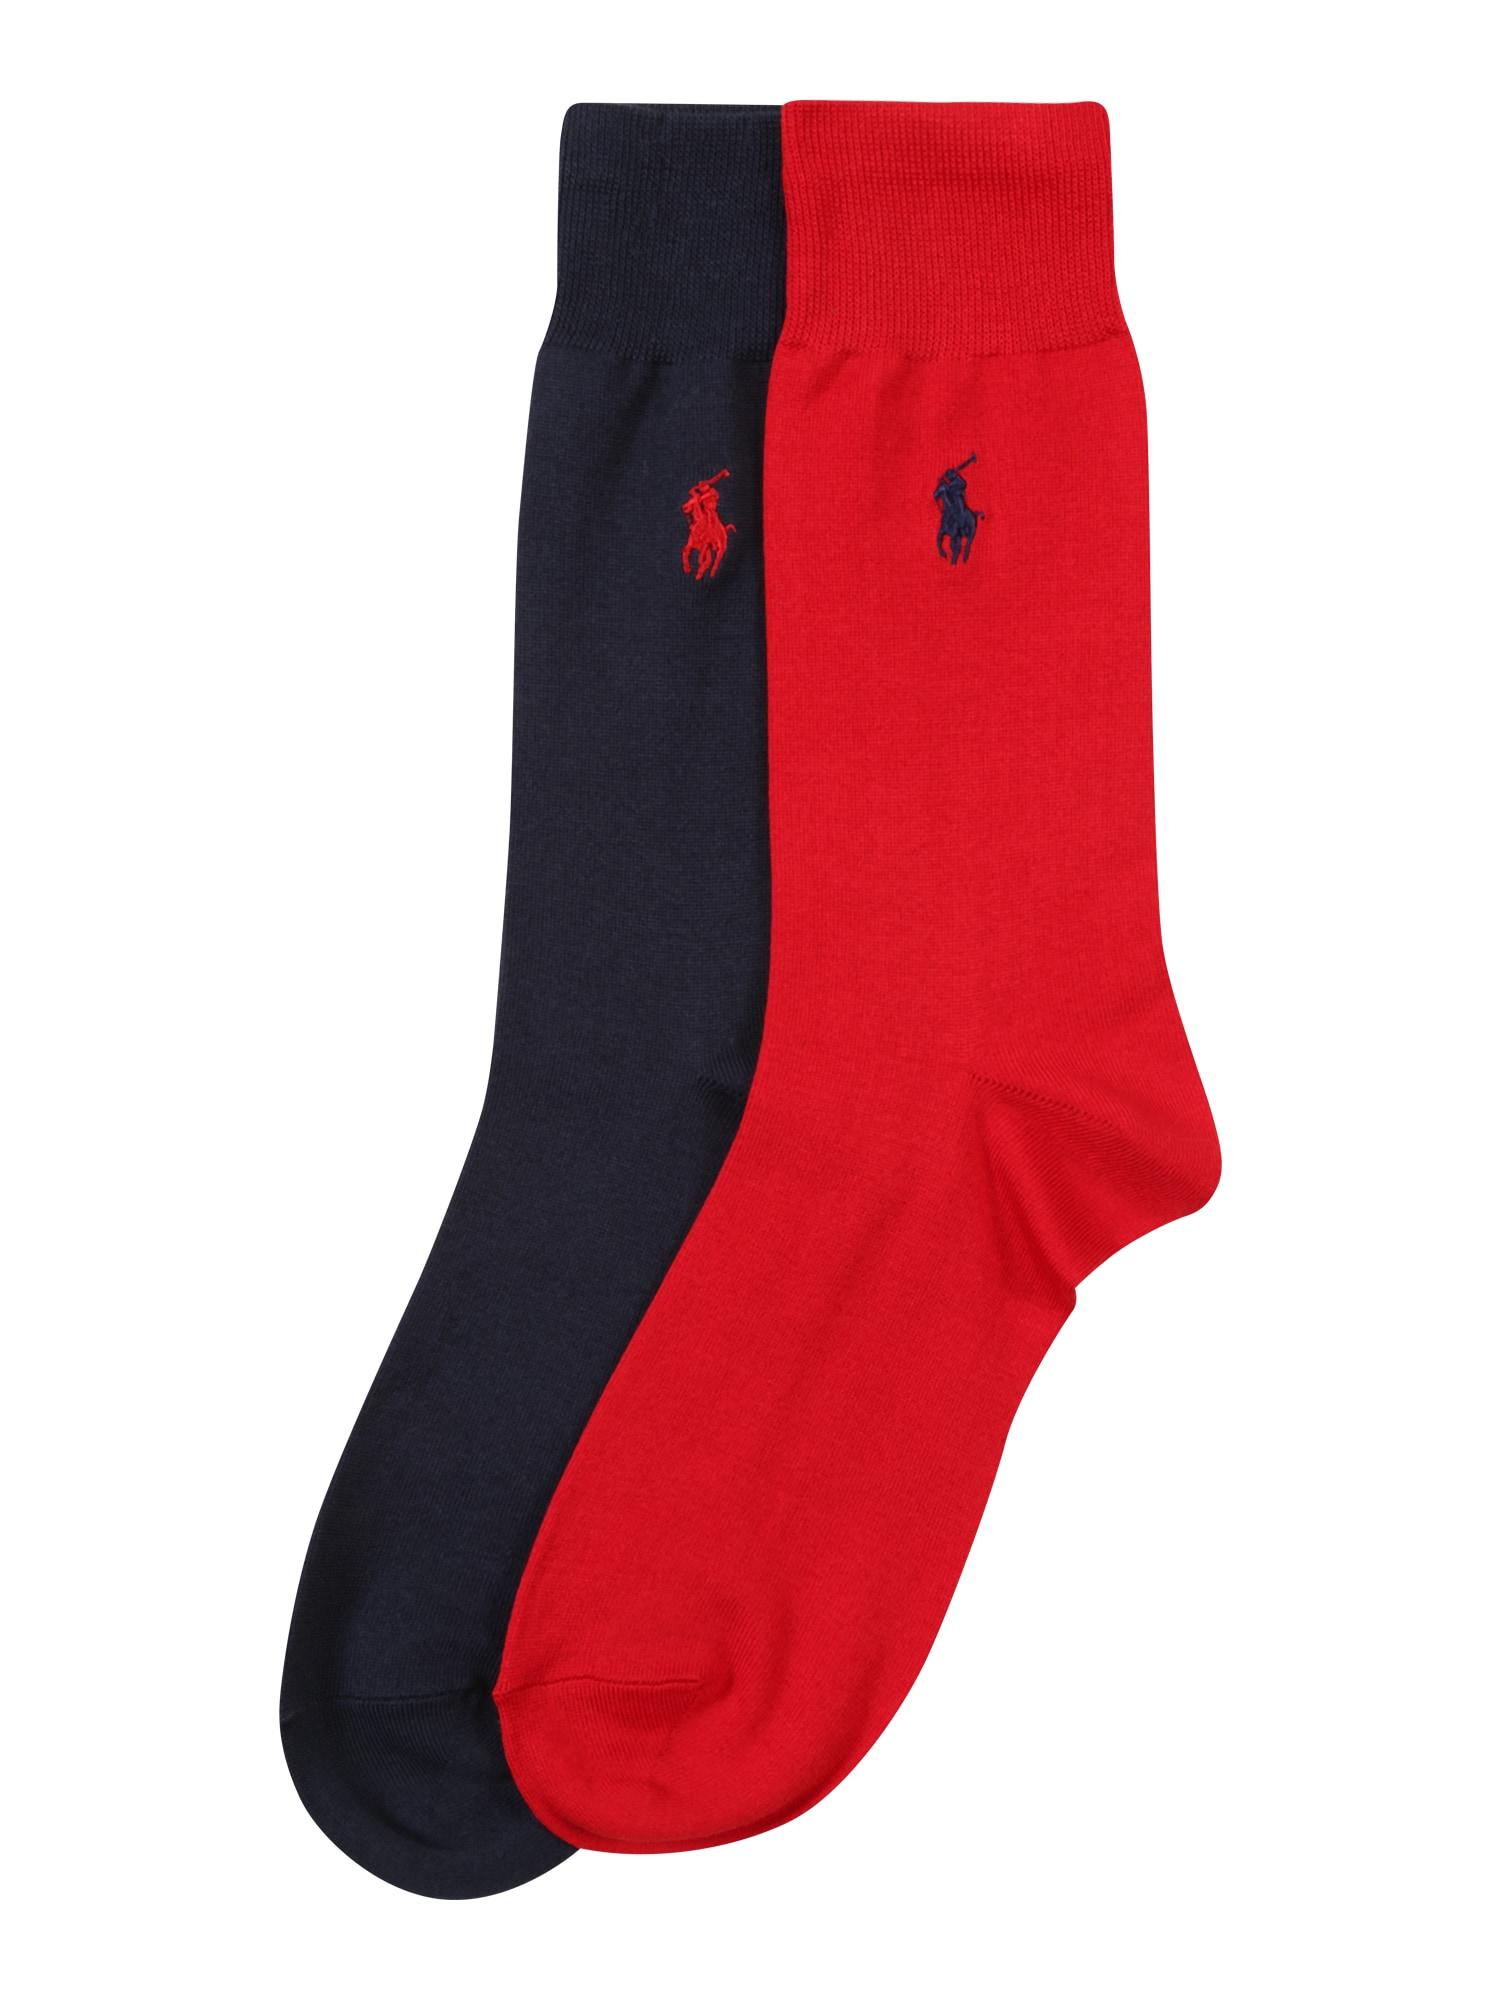 Ponožky modrá červená POLO RALPH LAUREN